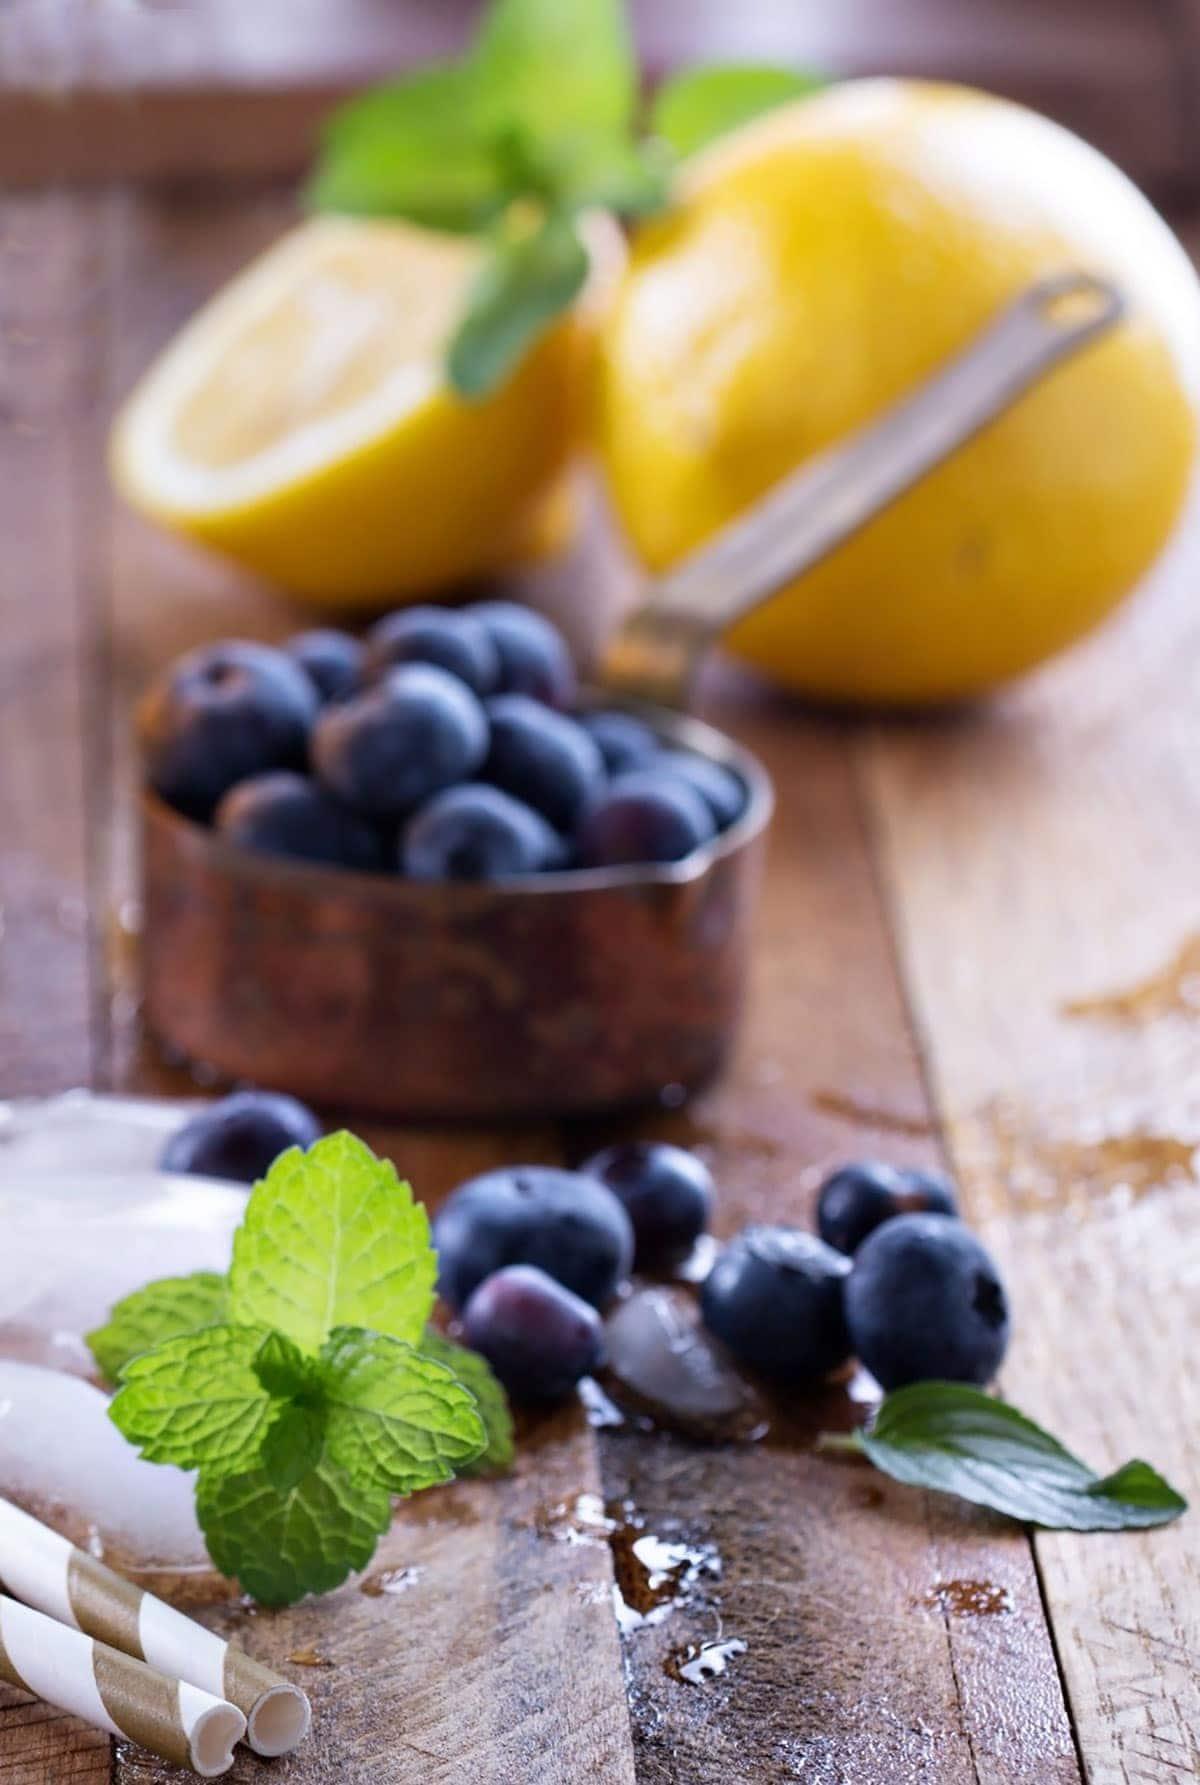 blueberry lemonade ingredients, blueberries, lemon on a wooden background